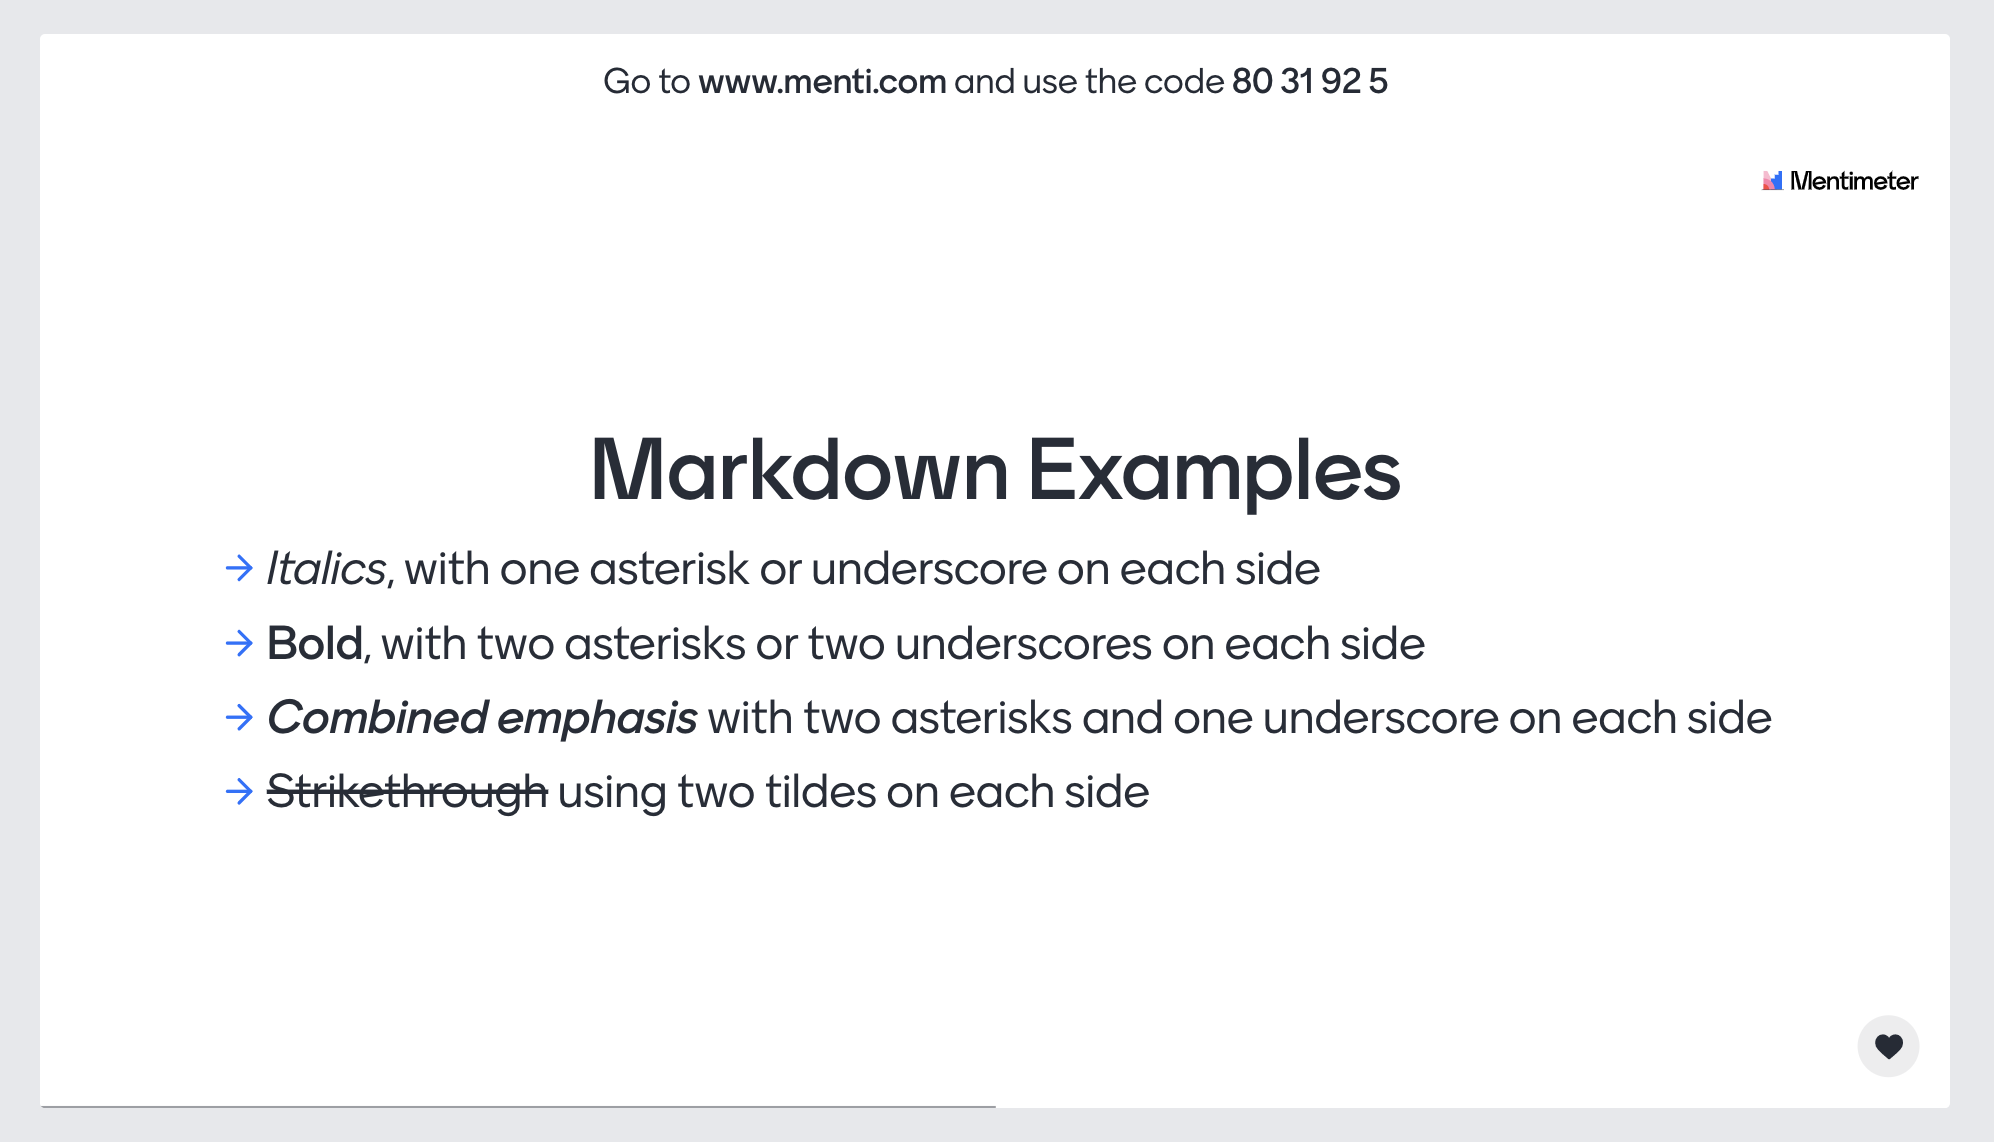 markdown-examples-newbrand.png